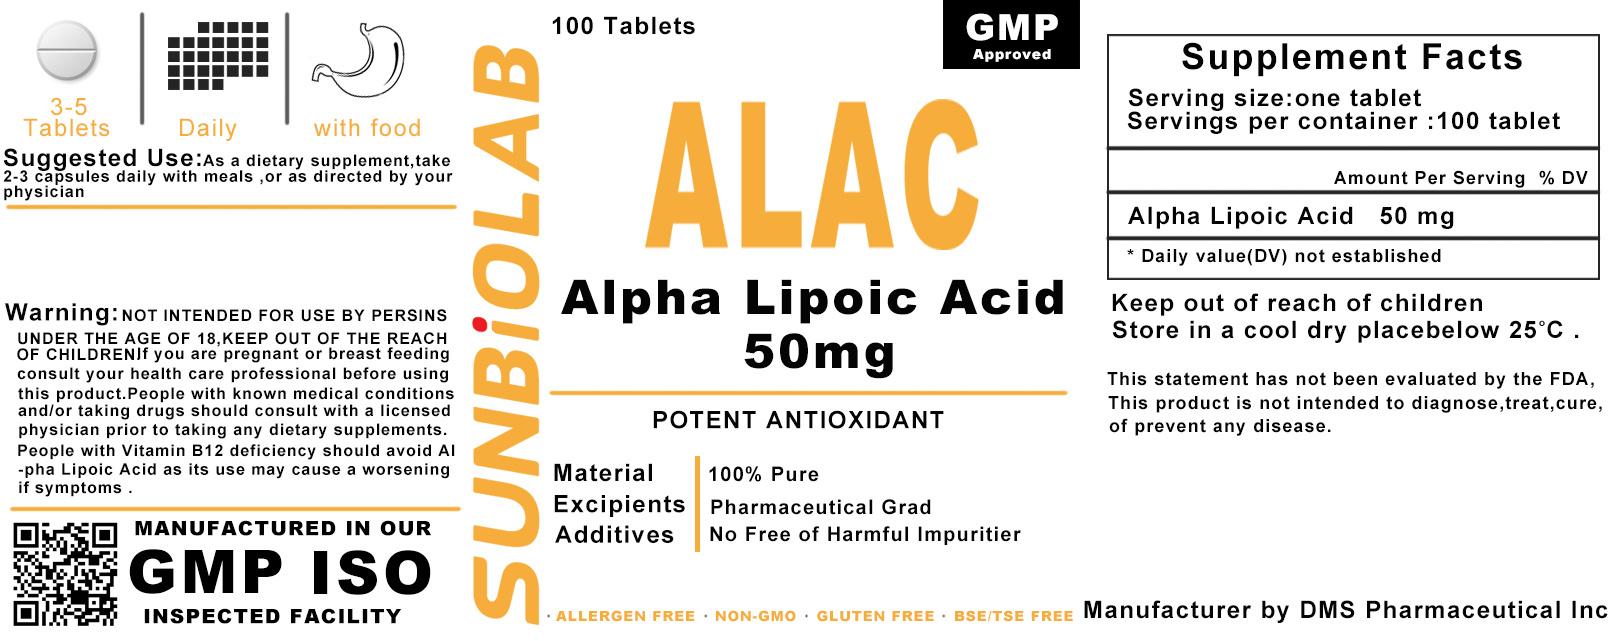 Thioctic Acid (Lipoic Acid) Tablet 50mg GMP Factory